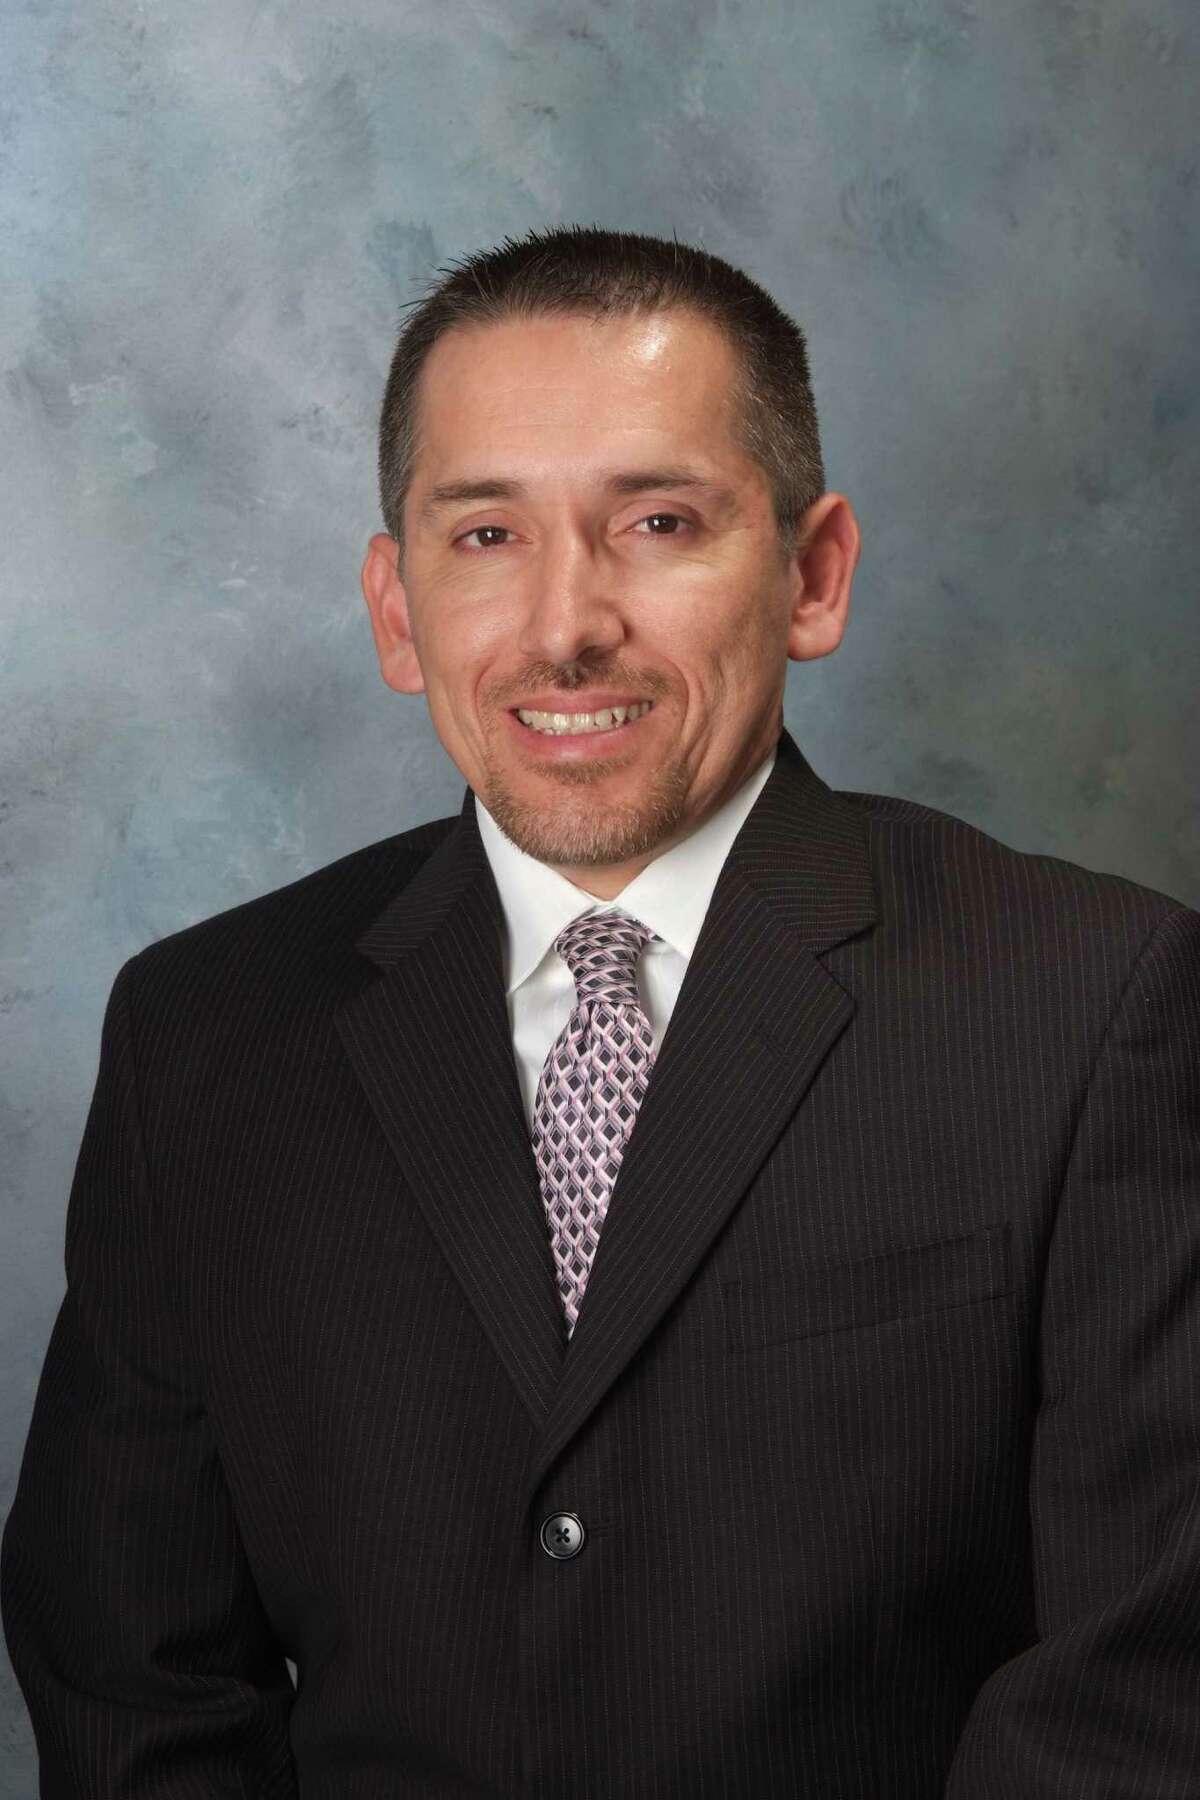 Manuel M. Hinojosa